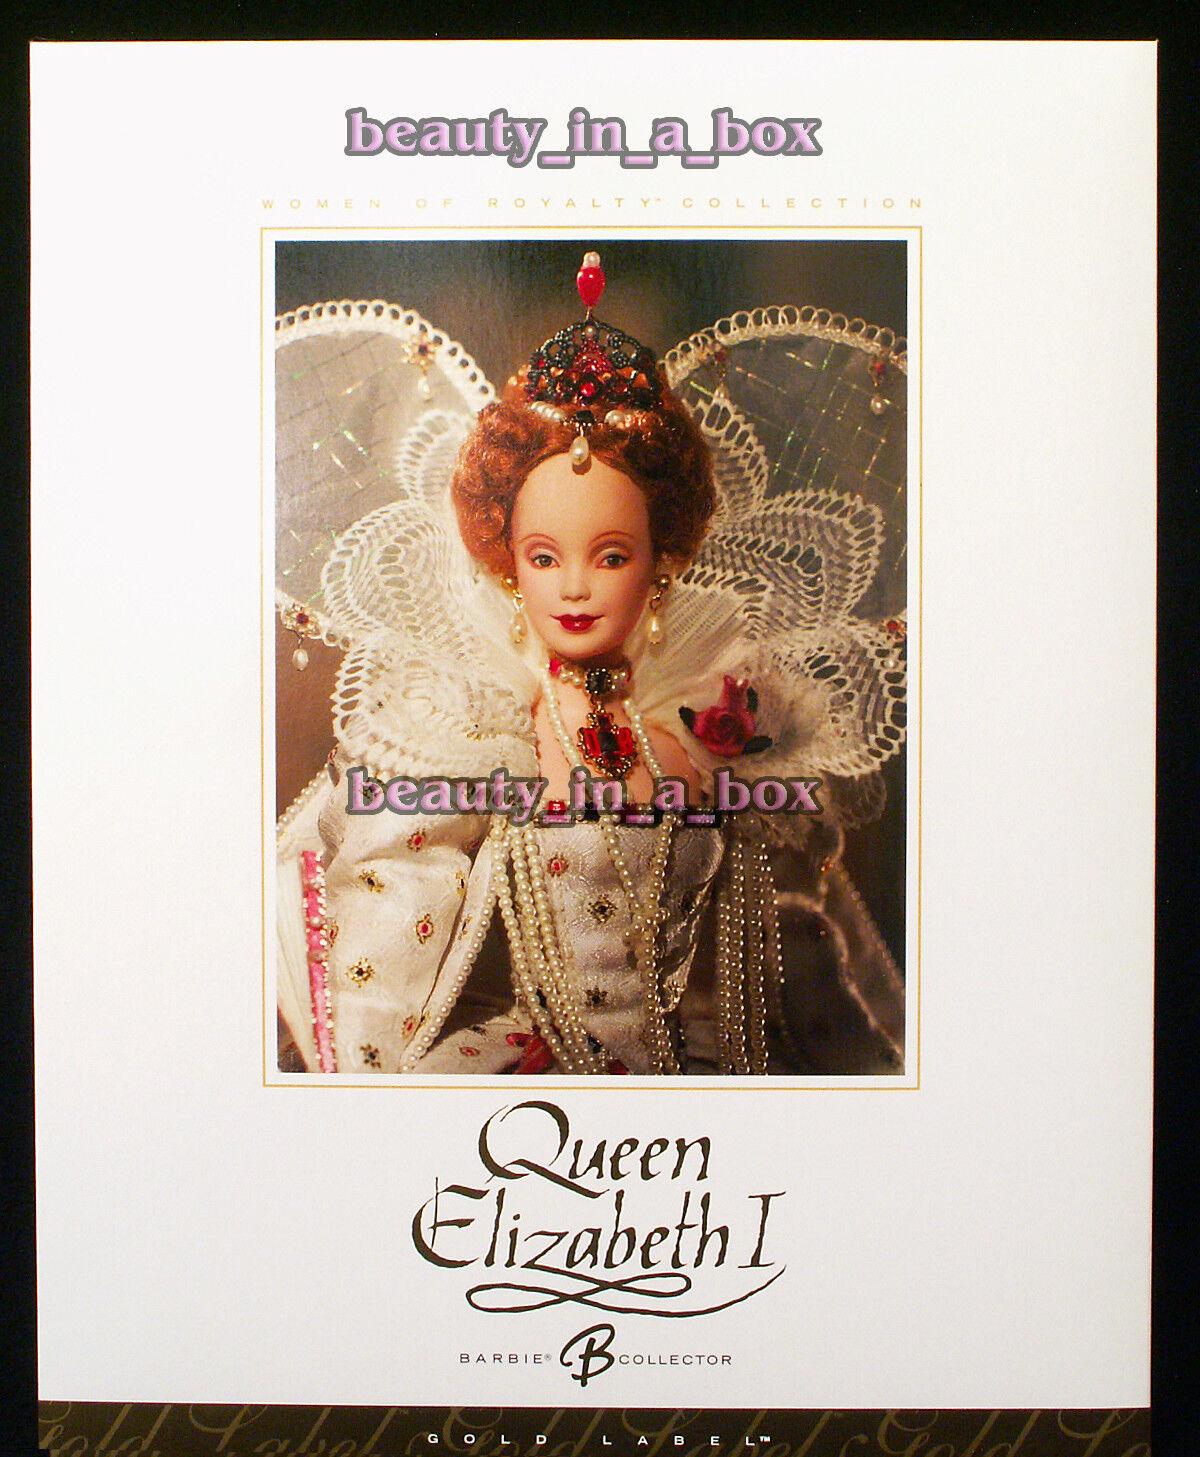 La reina Isabel I Muñeca Barbie mujeres de la realeza Serie oro Label  mnrfb Exc